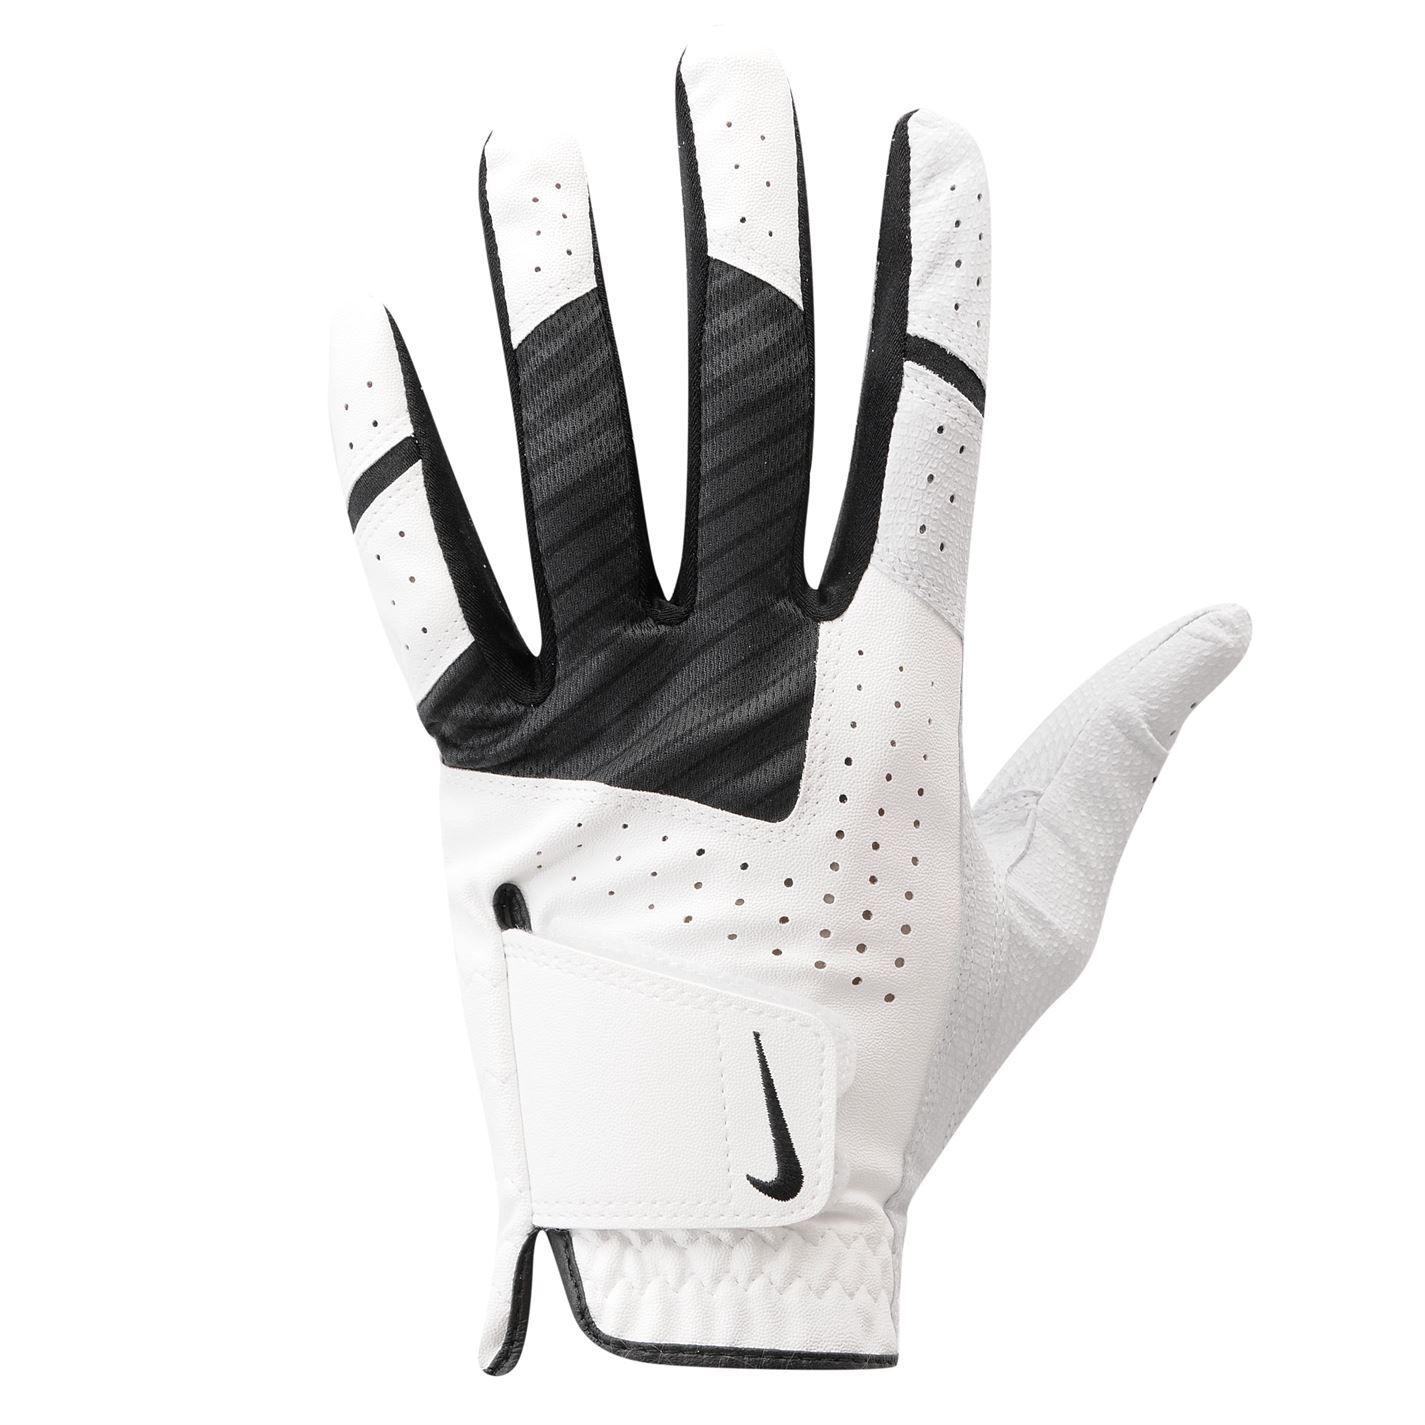 Footjoy Junior Golf Glove Gloves, Nike tech, Mens gloves